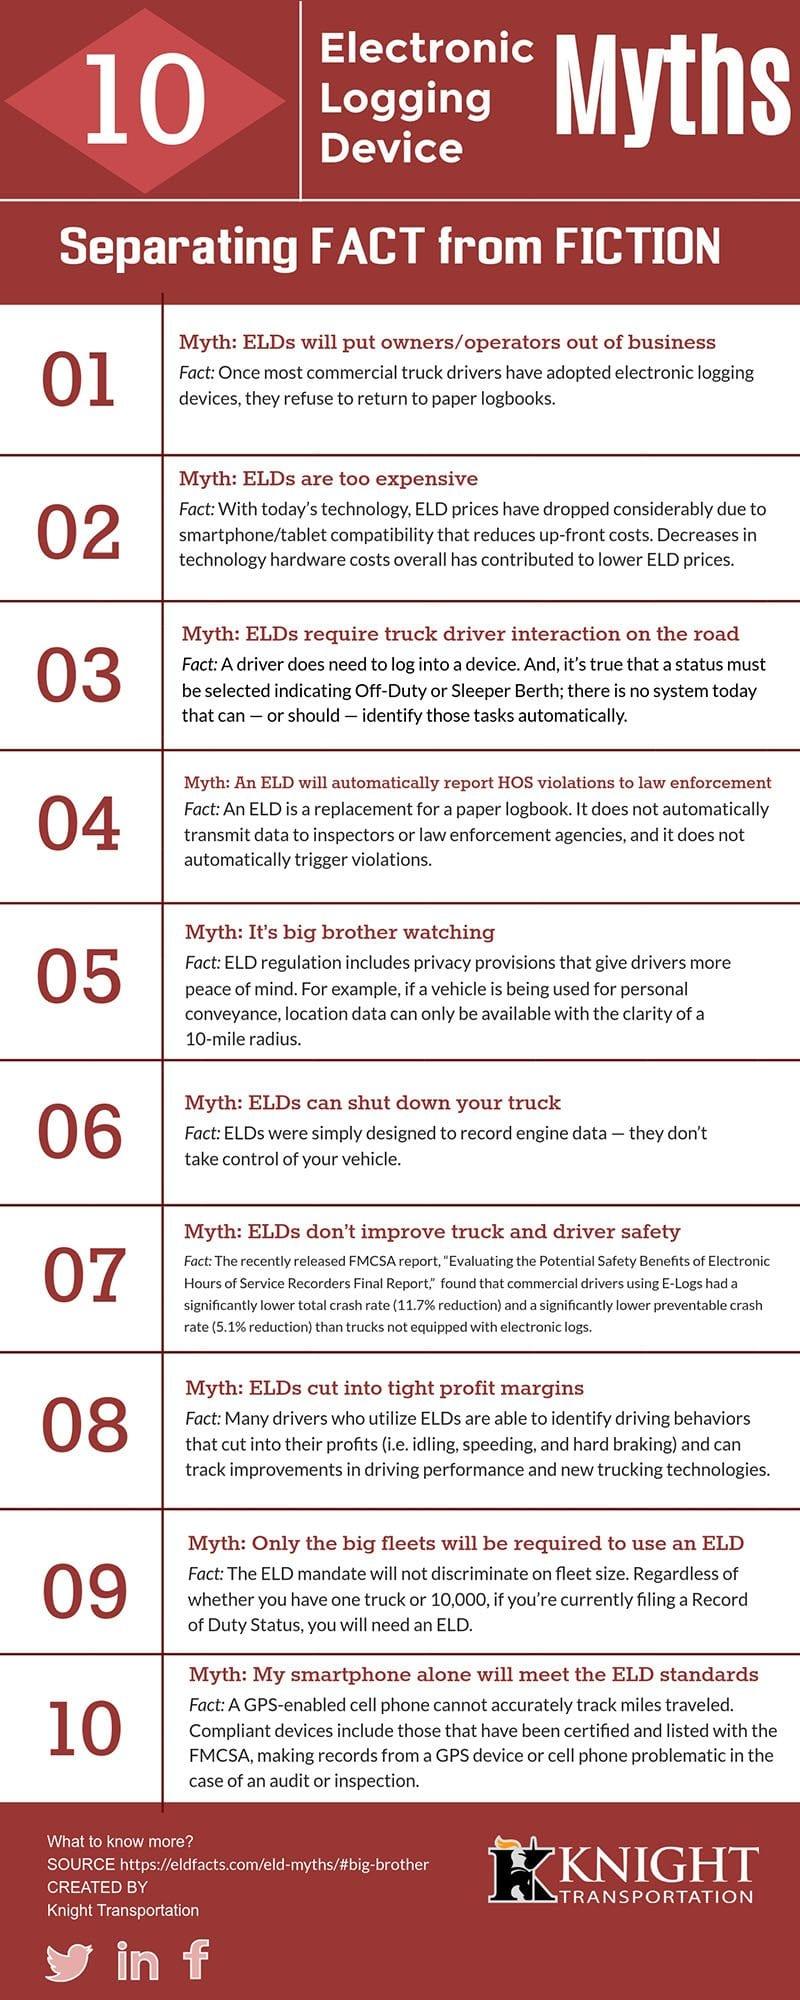 Electronic Logging Device Myths